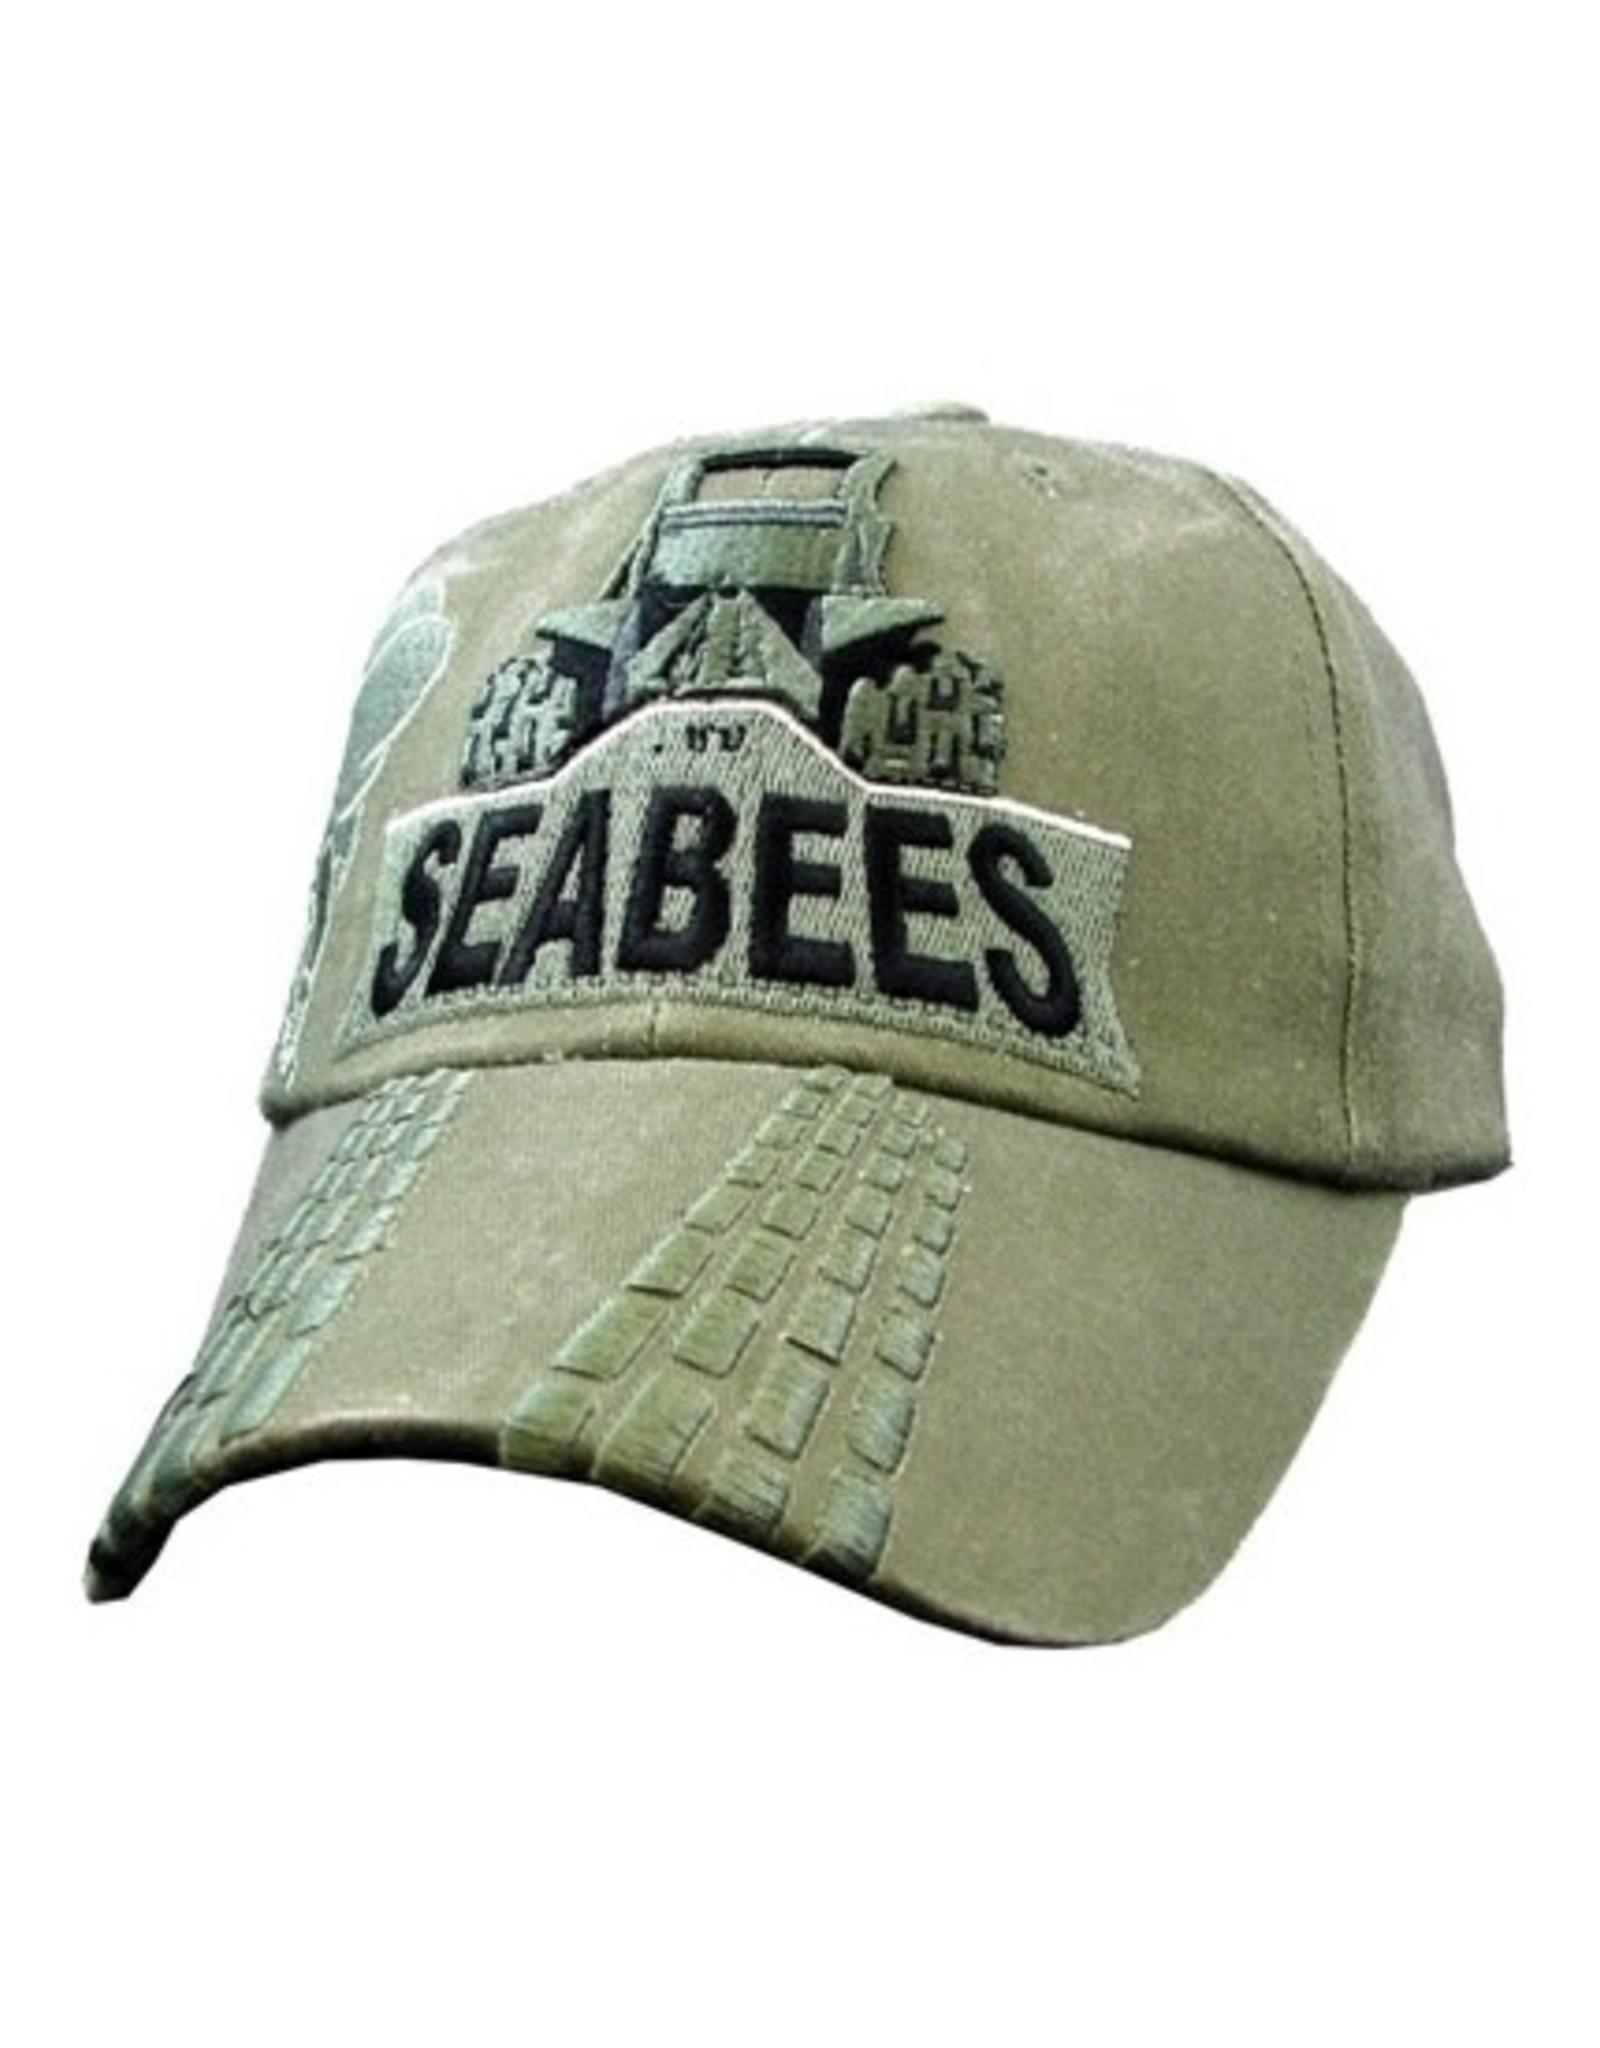 MidMil Navy Seabees Bulldozer Hat Olive Drab